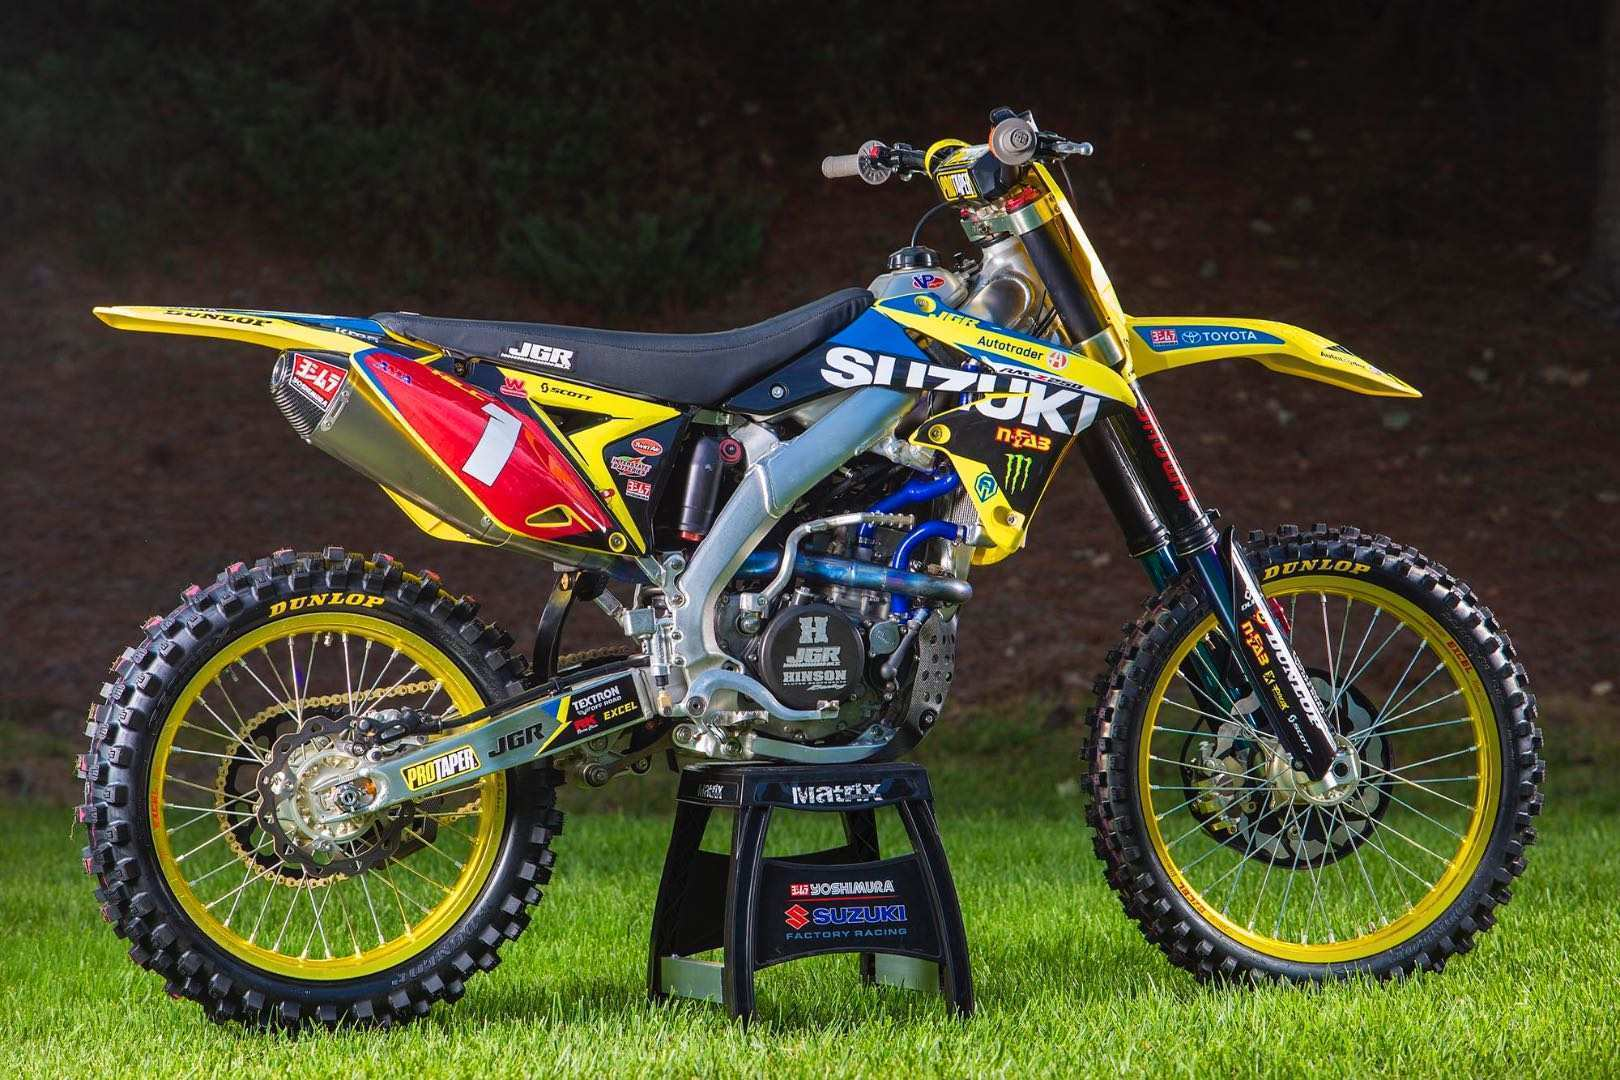 30 All New 2019 Suzuki Motocross Configurations with 2019 Suzuki Motocross